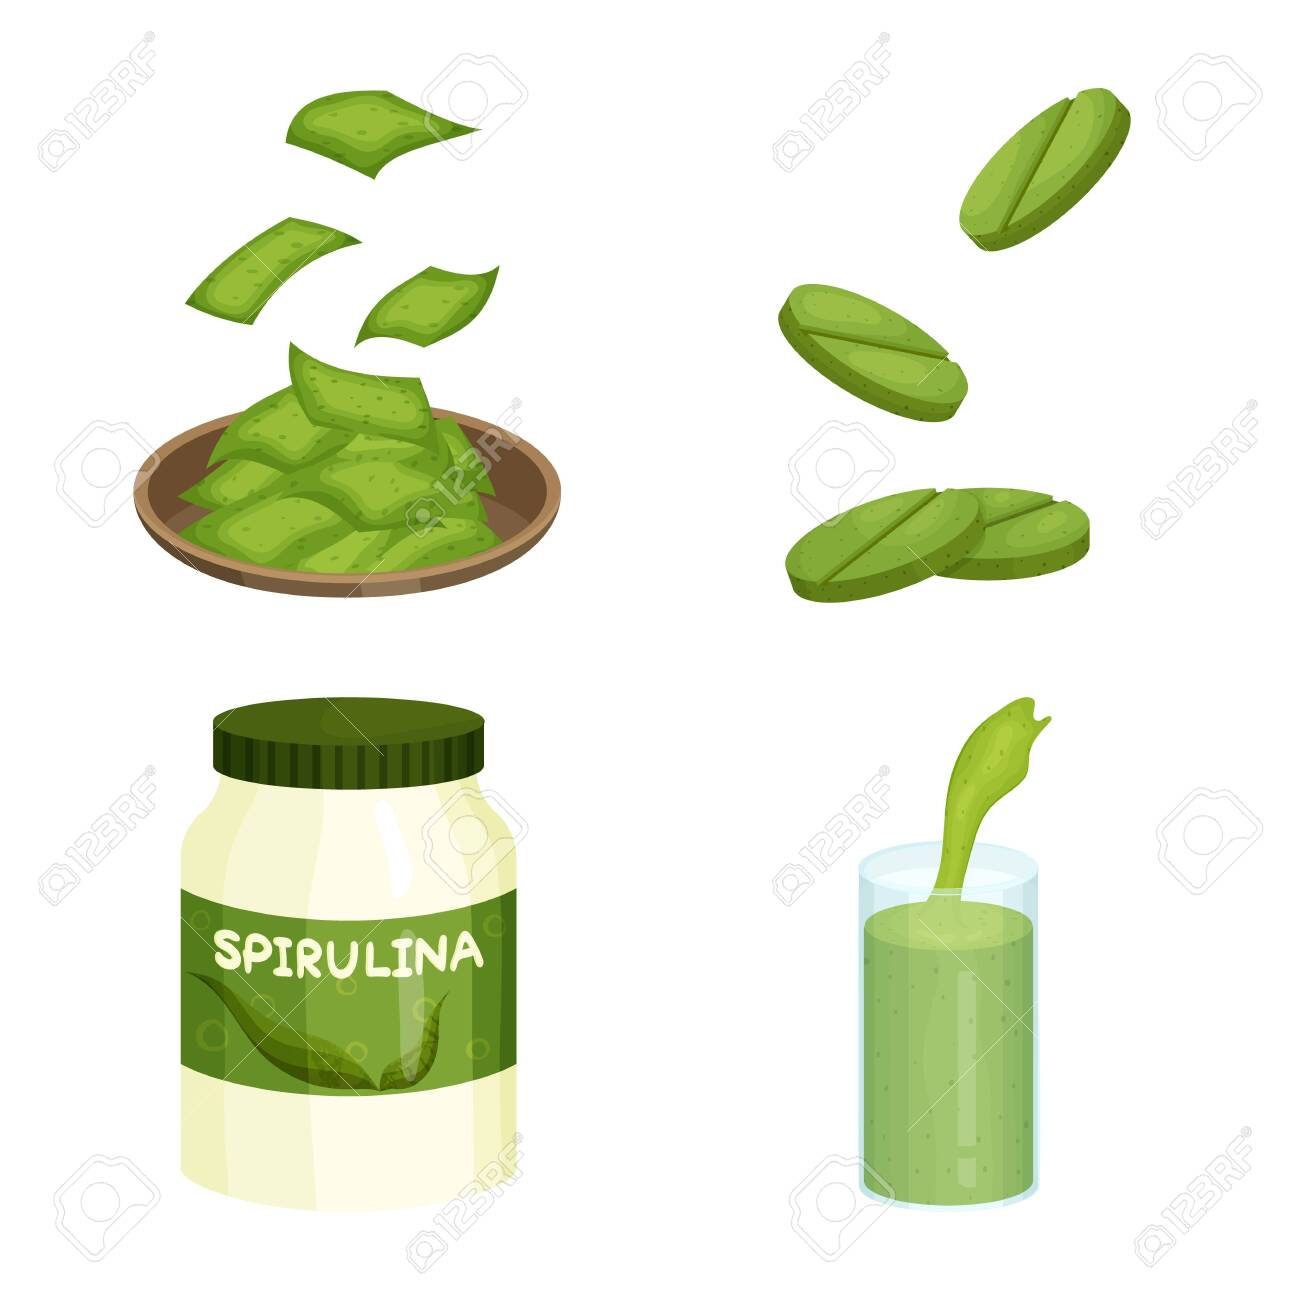 Vector illustration of spirulina and seaweed sign. Set of spirulina and vegan stock symbol for web. - 143495917